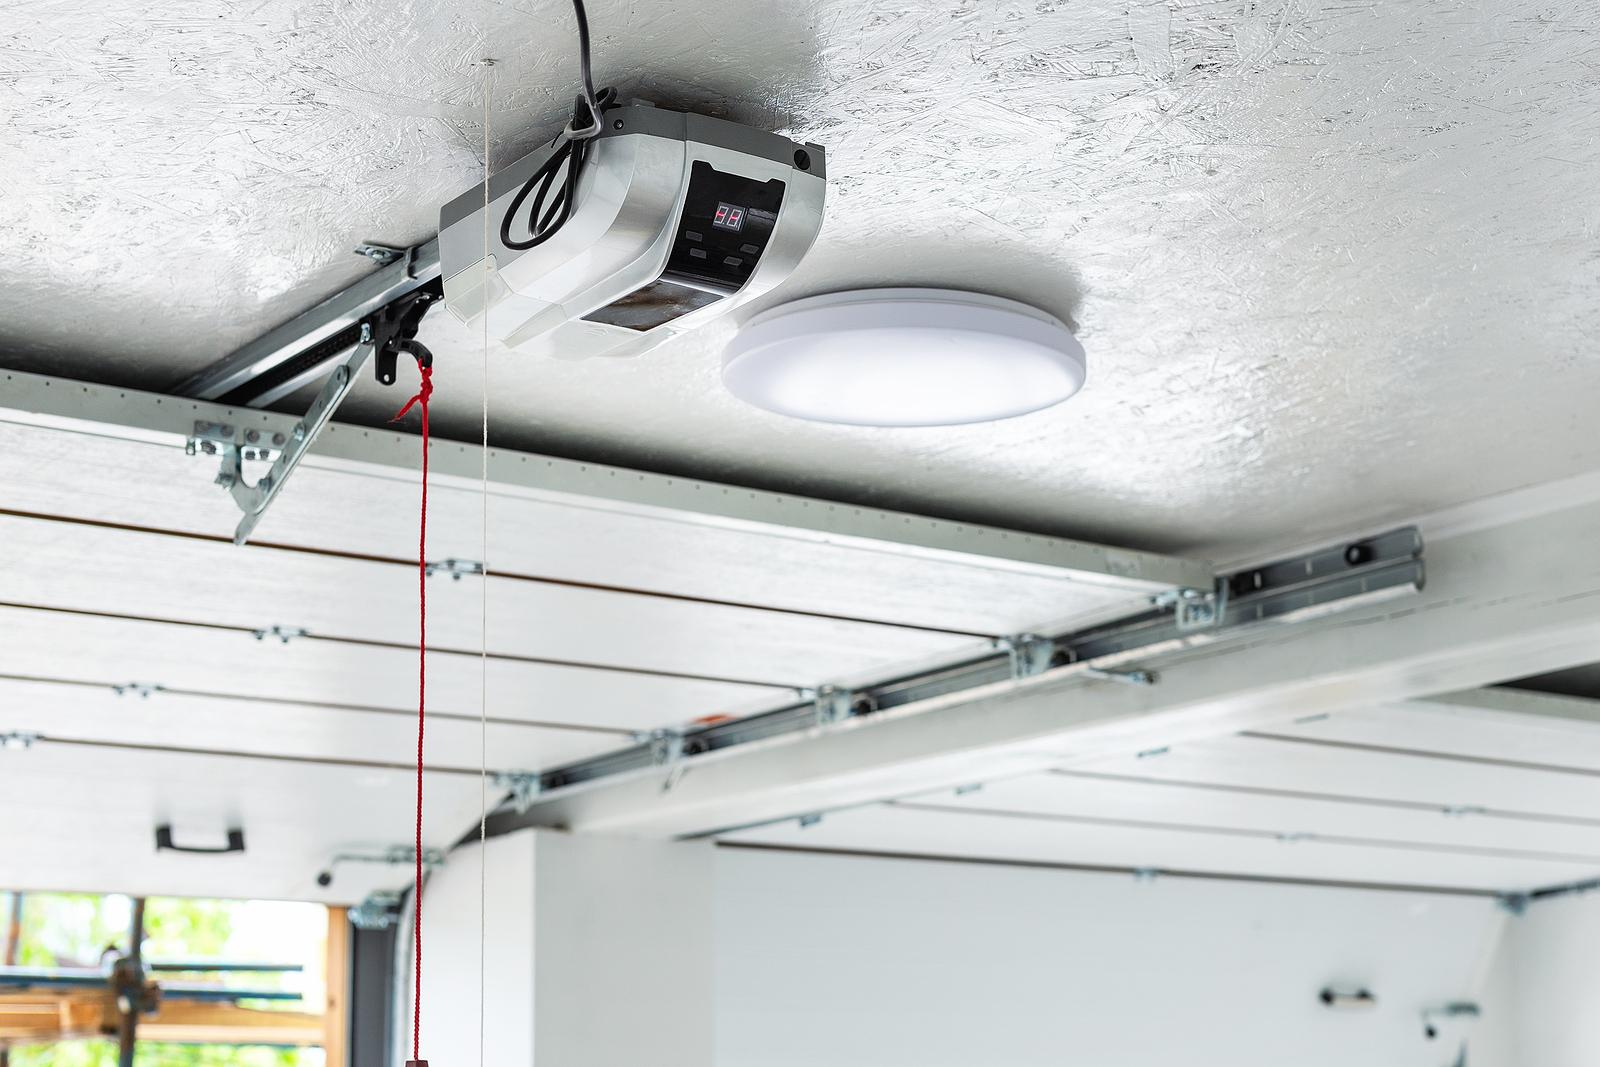 Opening-Door-And-Automatic-Garage-Door-Opener-Mounted-on-Ceiling-with-Emergency-Cord